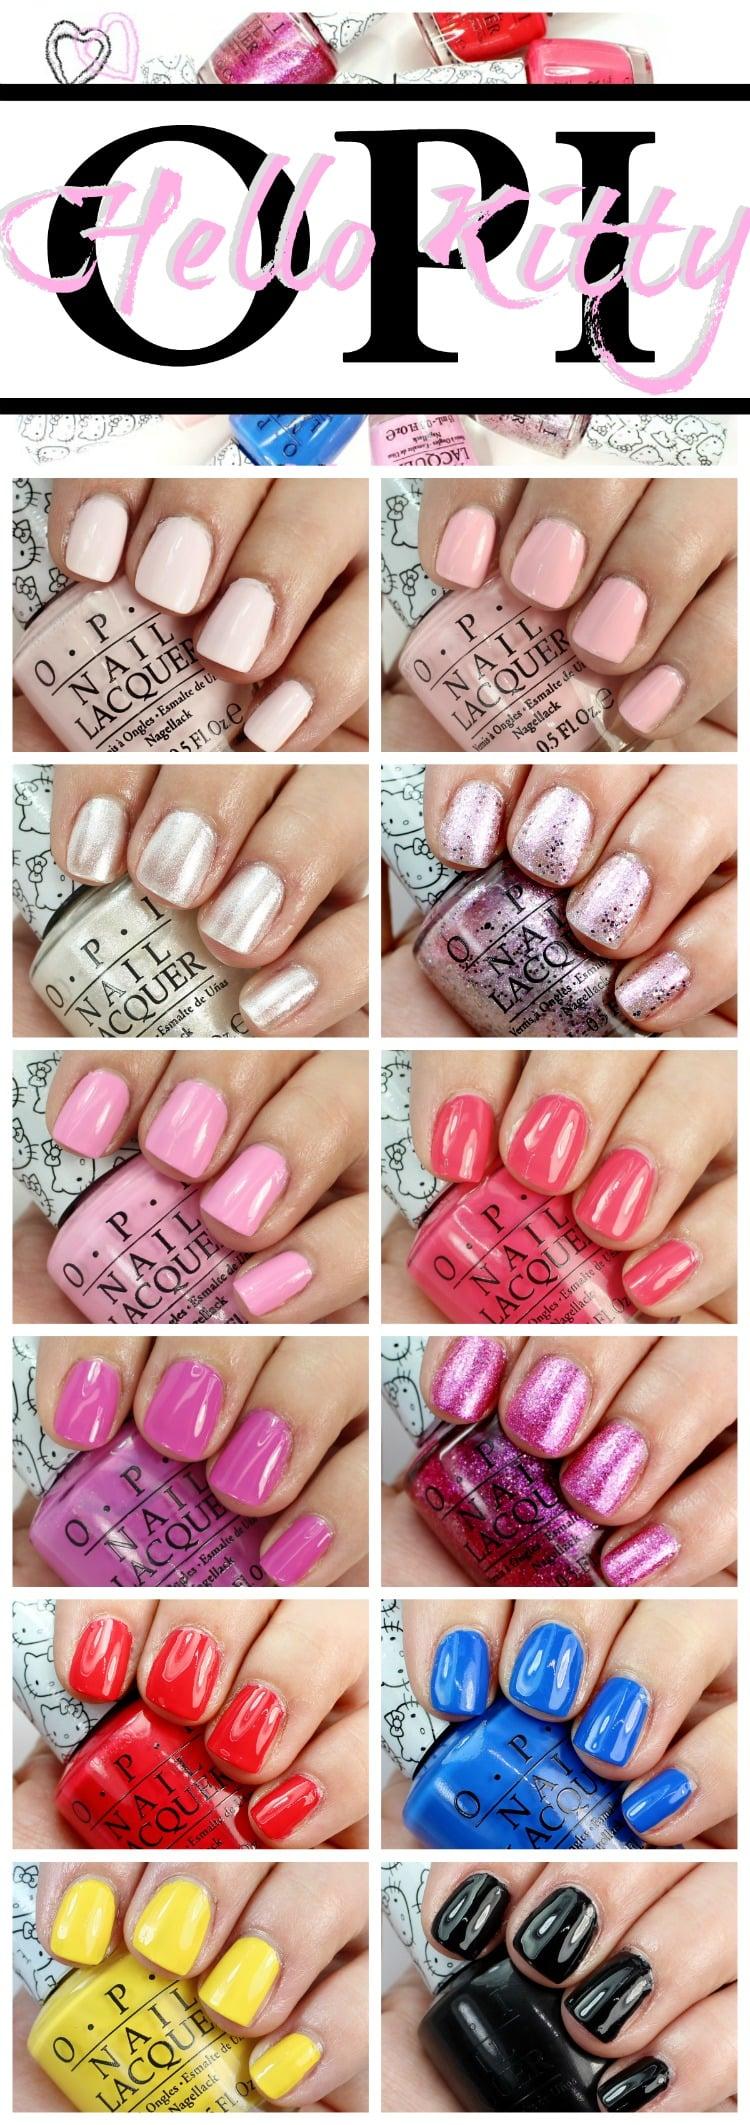 OPI Hello Kitty Swatches Nail polish lacquer